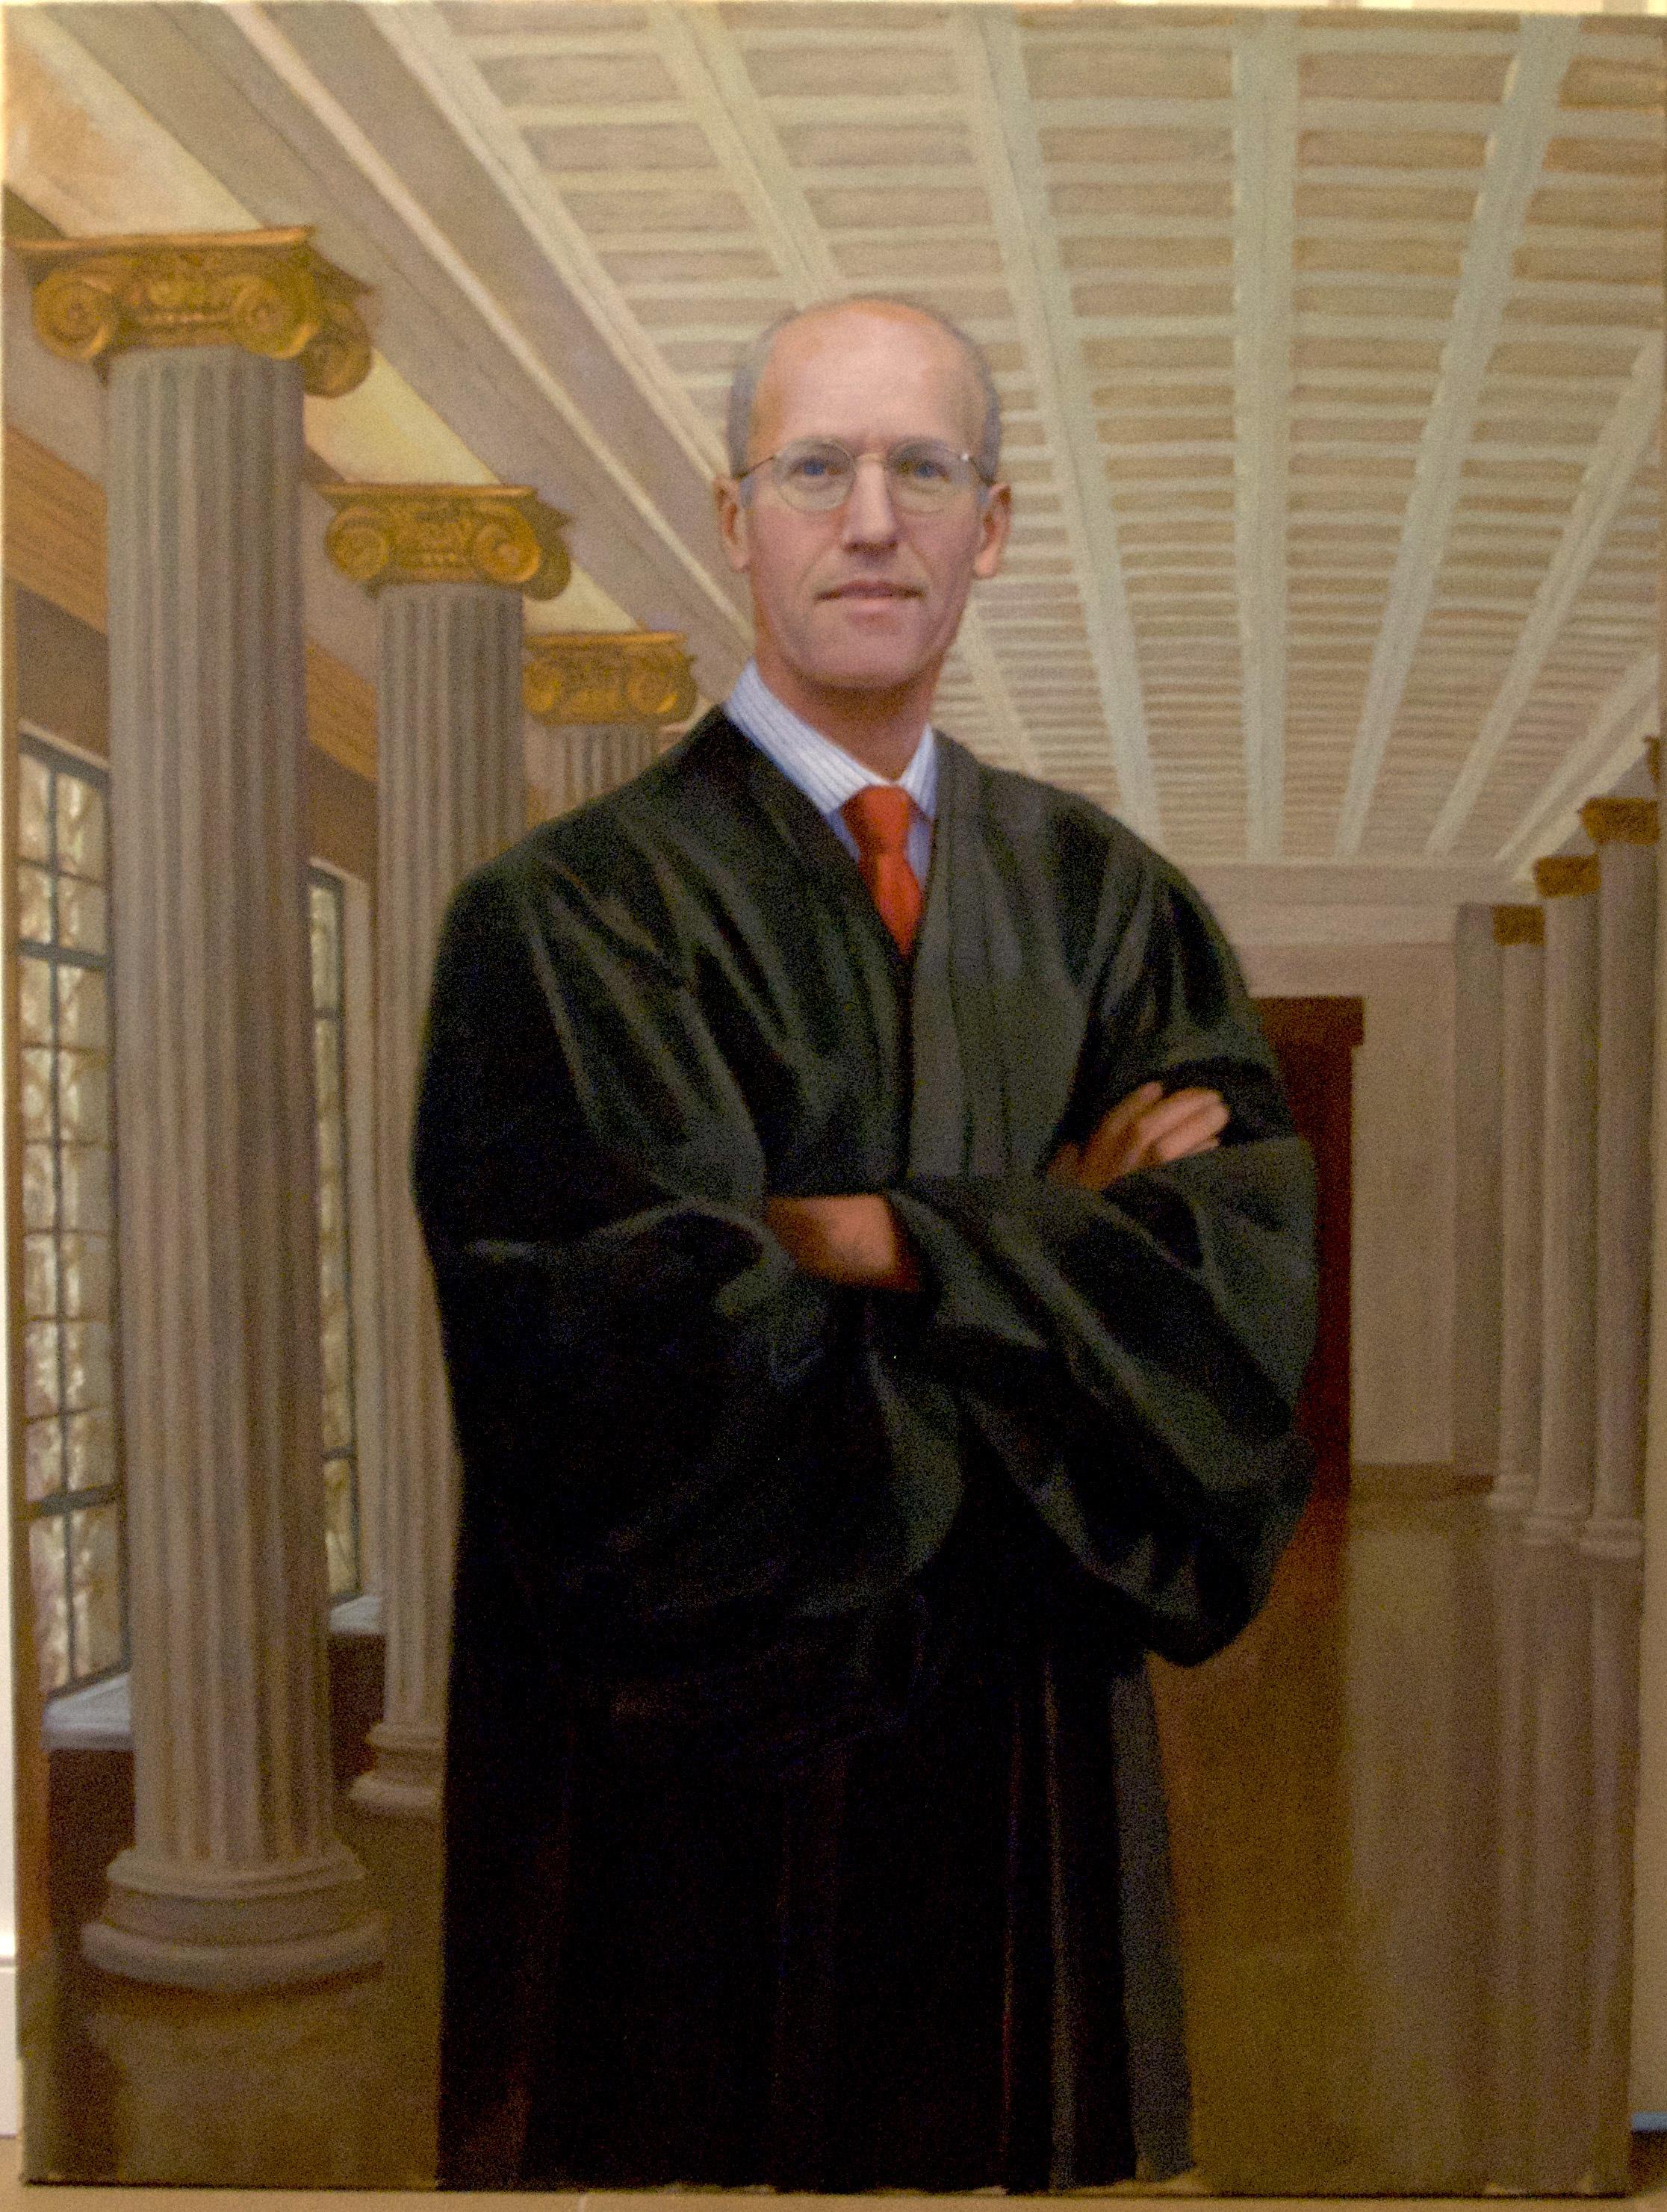 Judge Kravitz.jpg